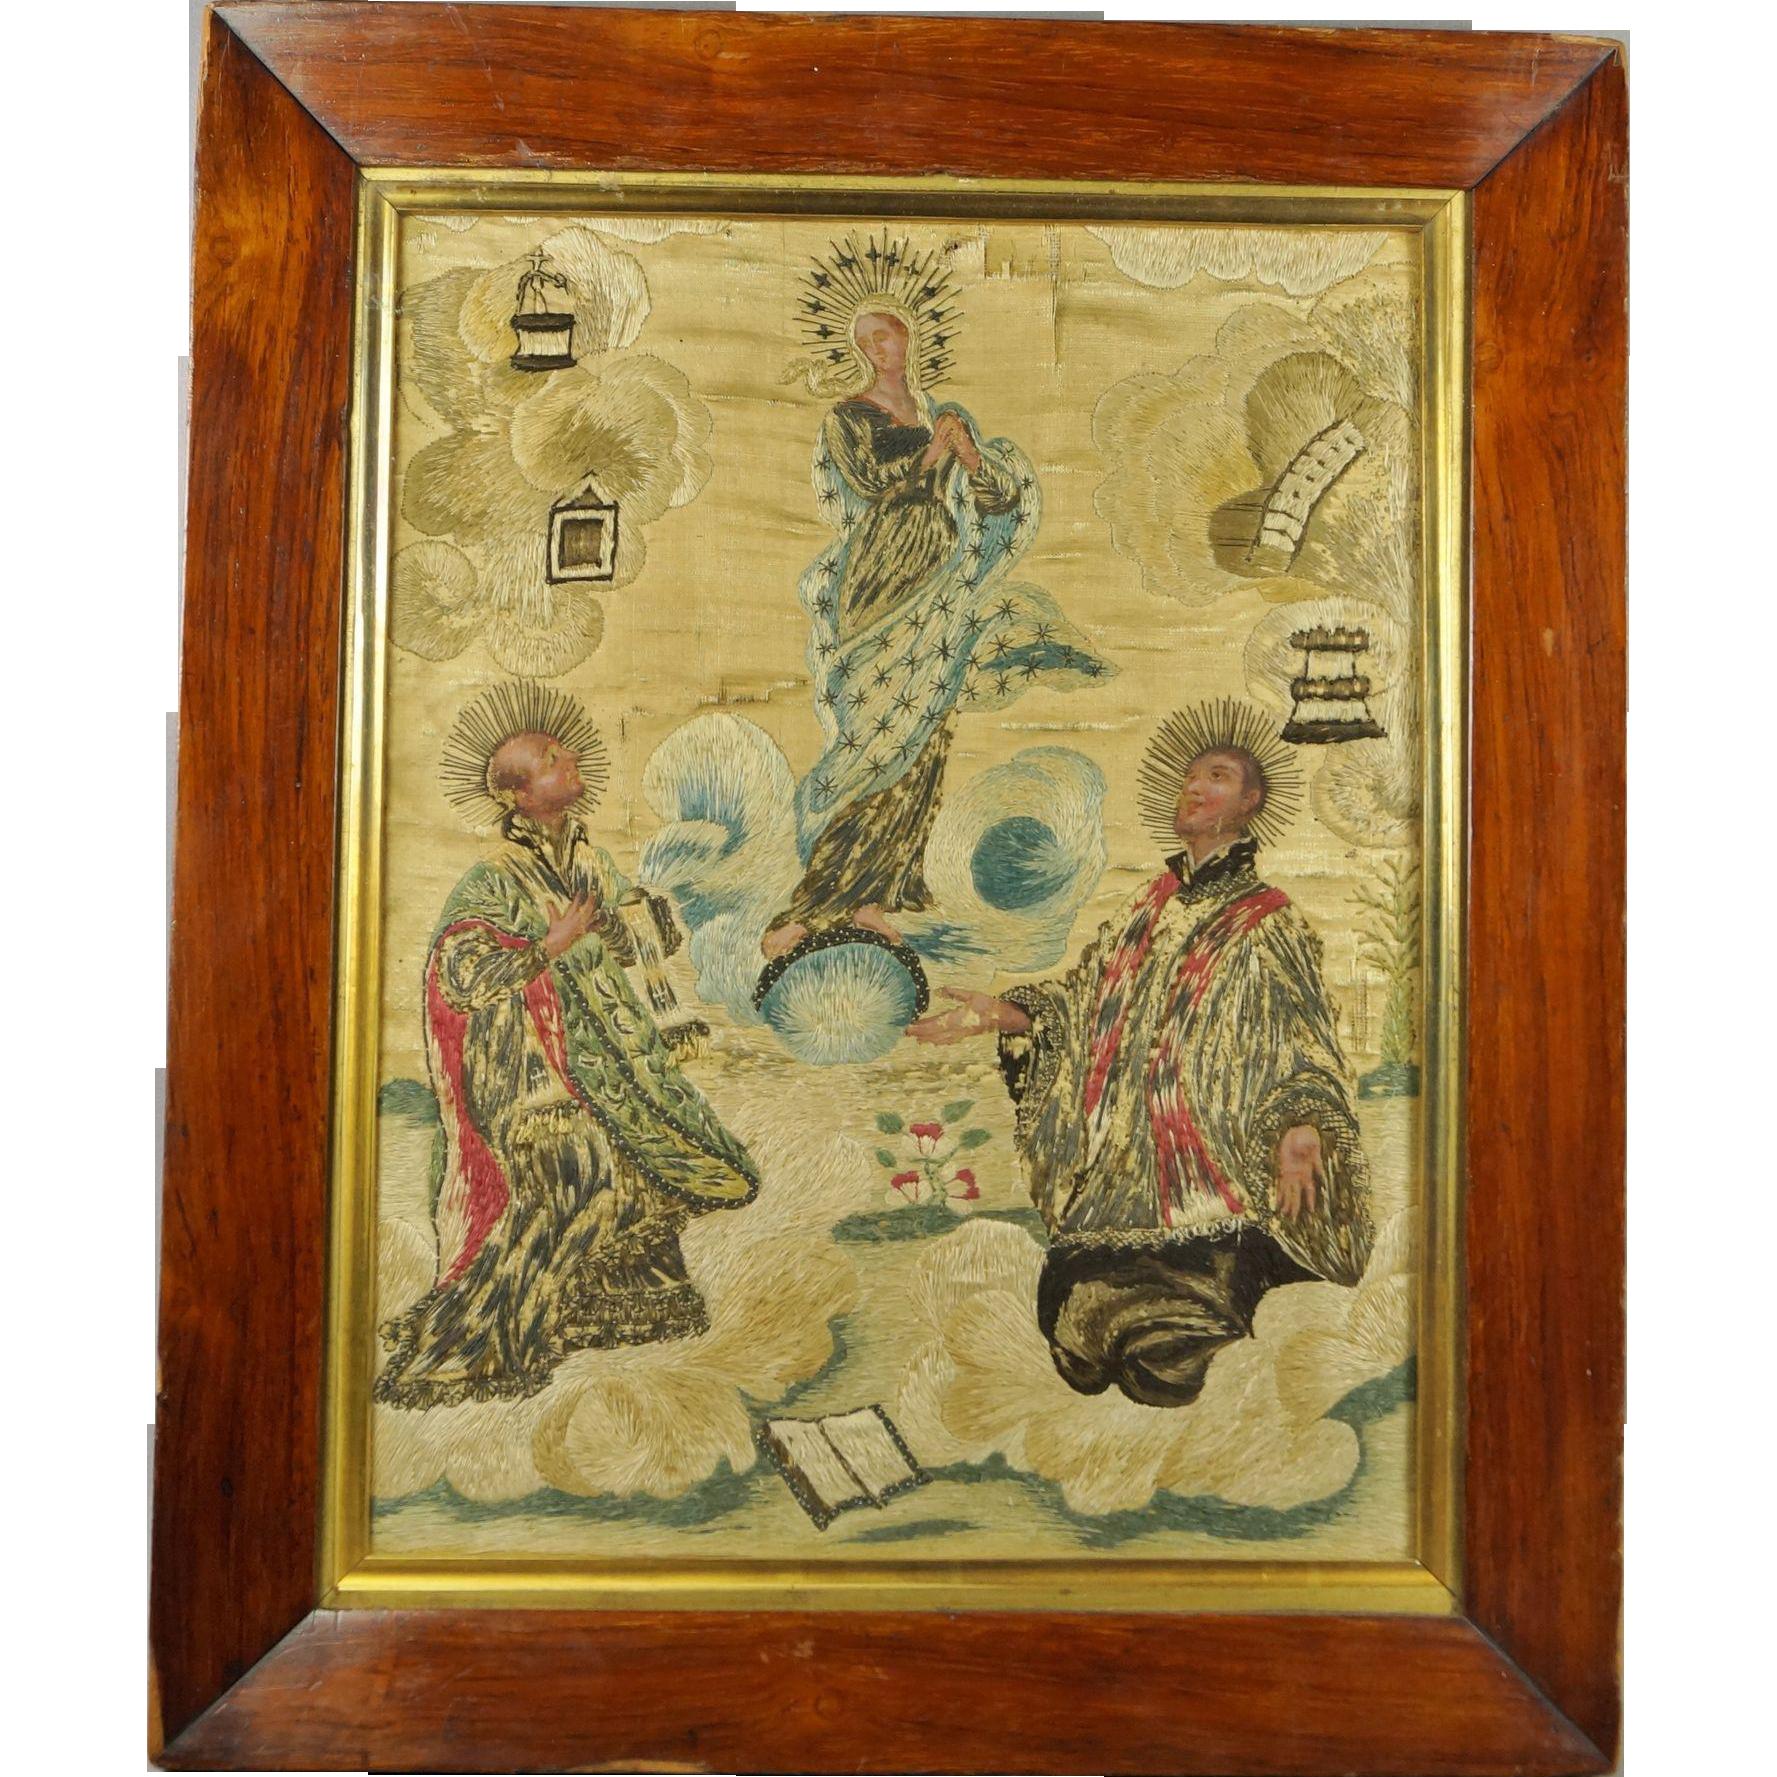 Antique 18th Century Silkwork Needlework Embroidery St Ignatius Loyola The Assumption of The Virgin Circa 1740